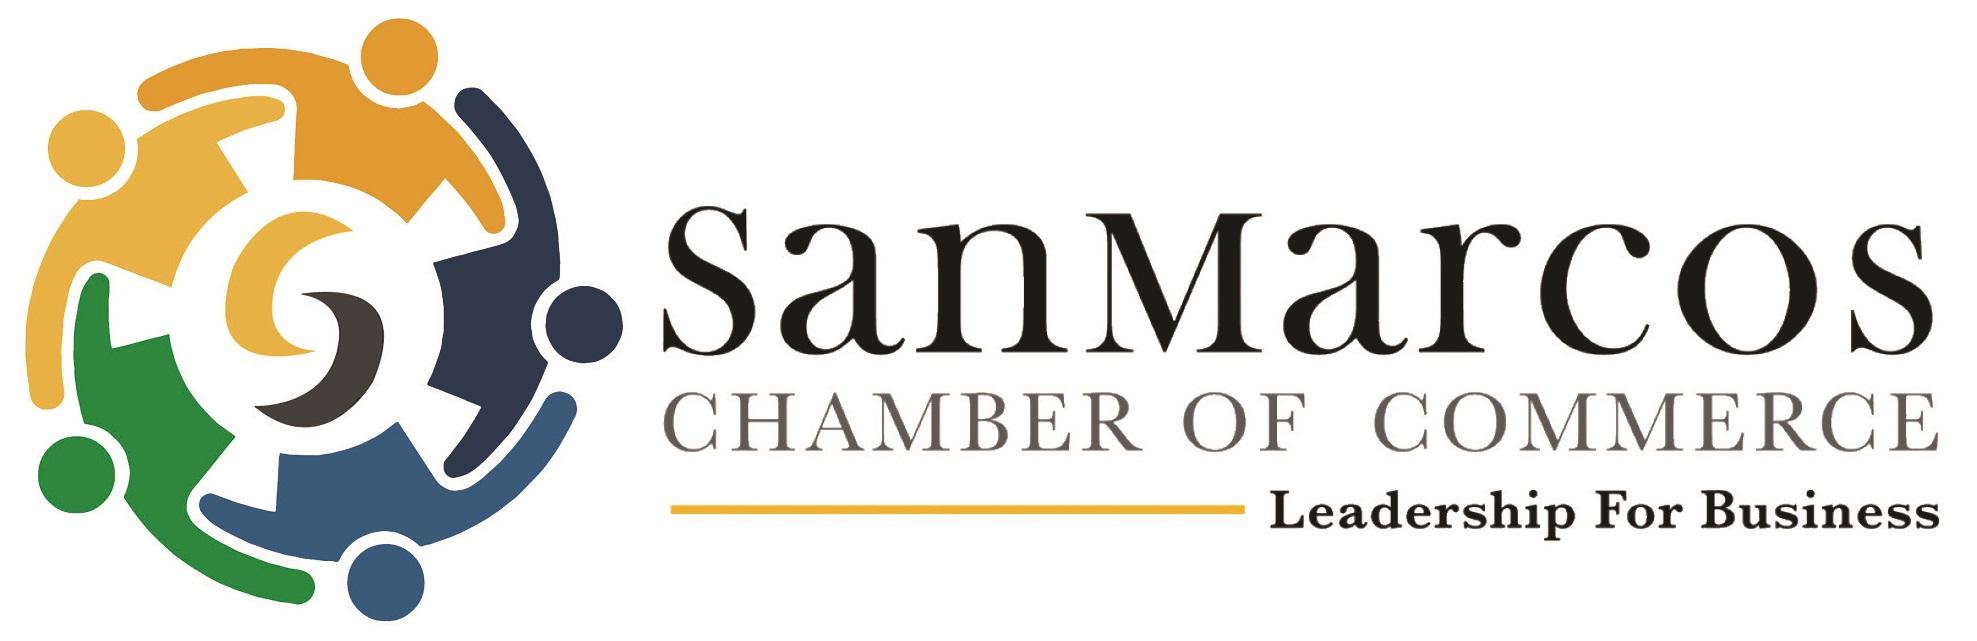 San_Marcos_chamber_logo_(1).jpg